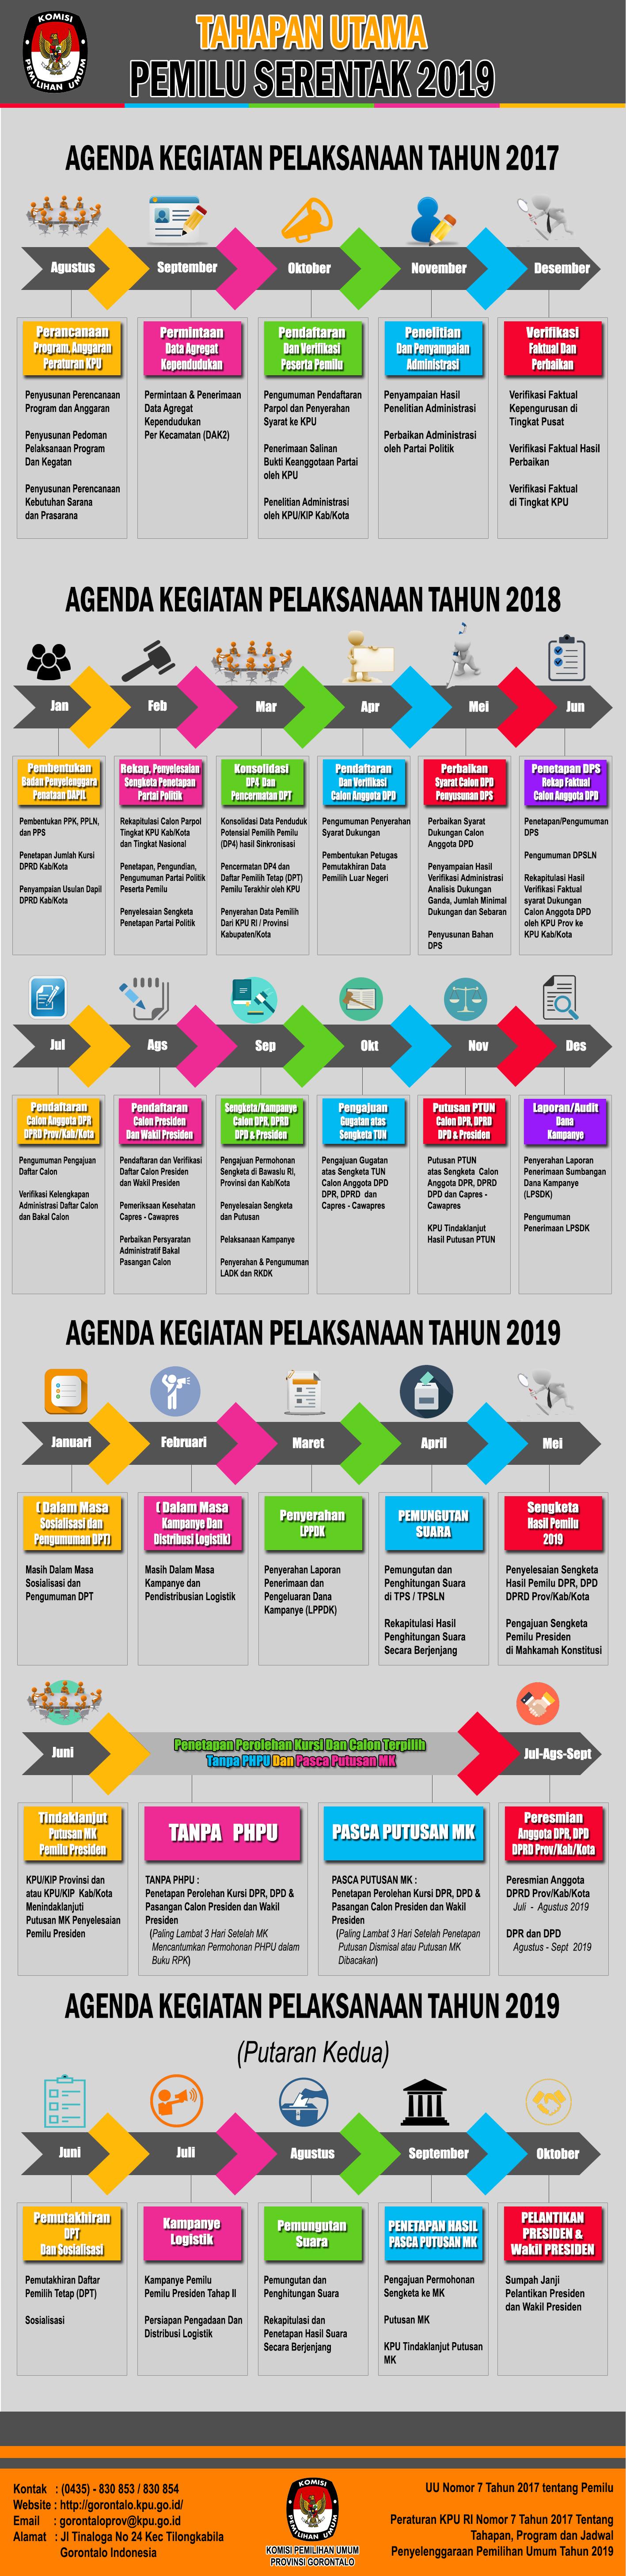 Tahapan Pemilu 2019